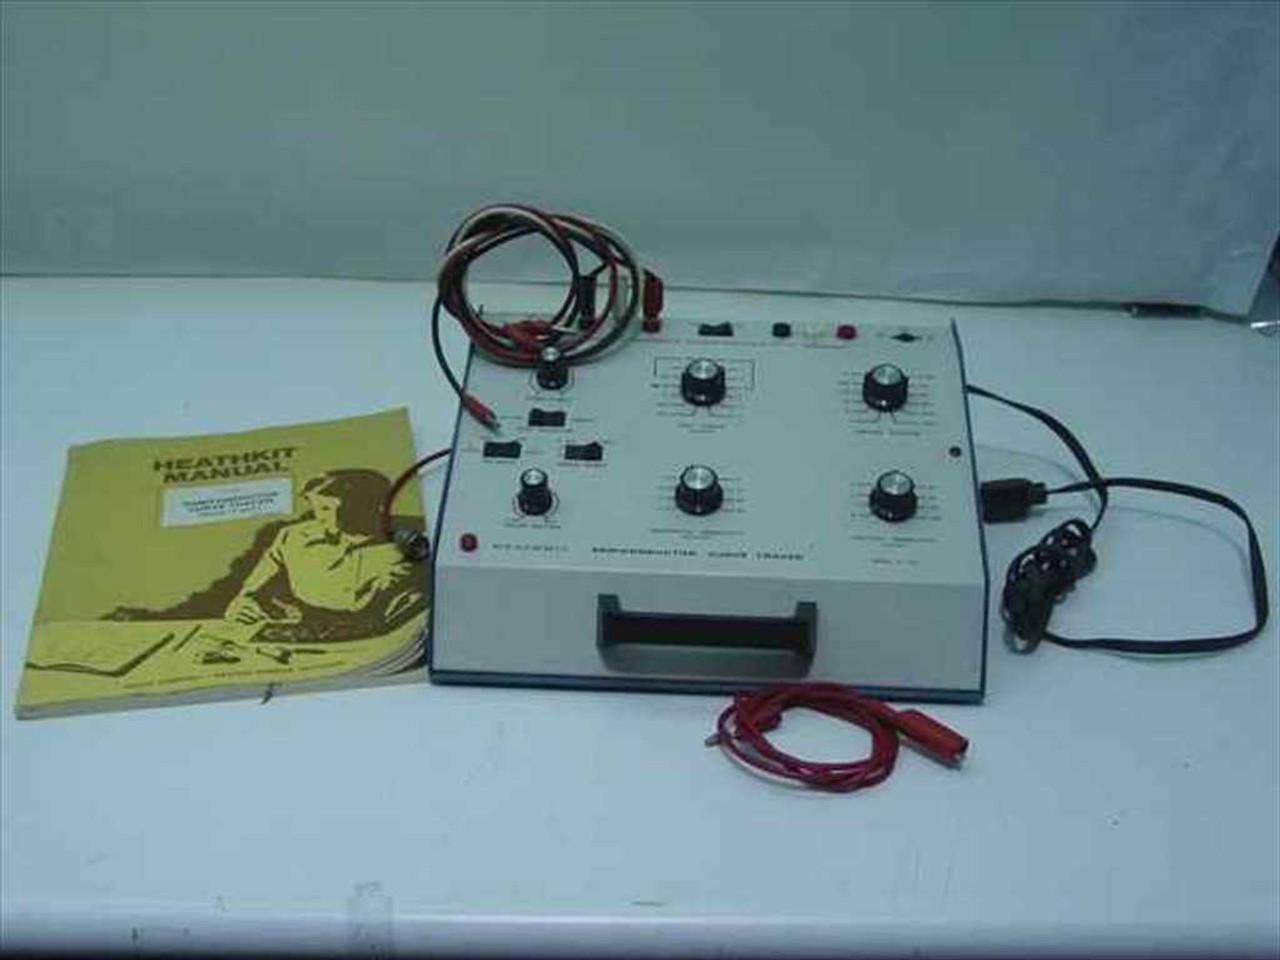 Heathkit It 3121 Semiconductor Curve Tracer Circuit Oscilloscope